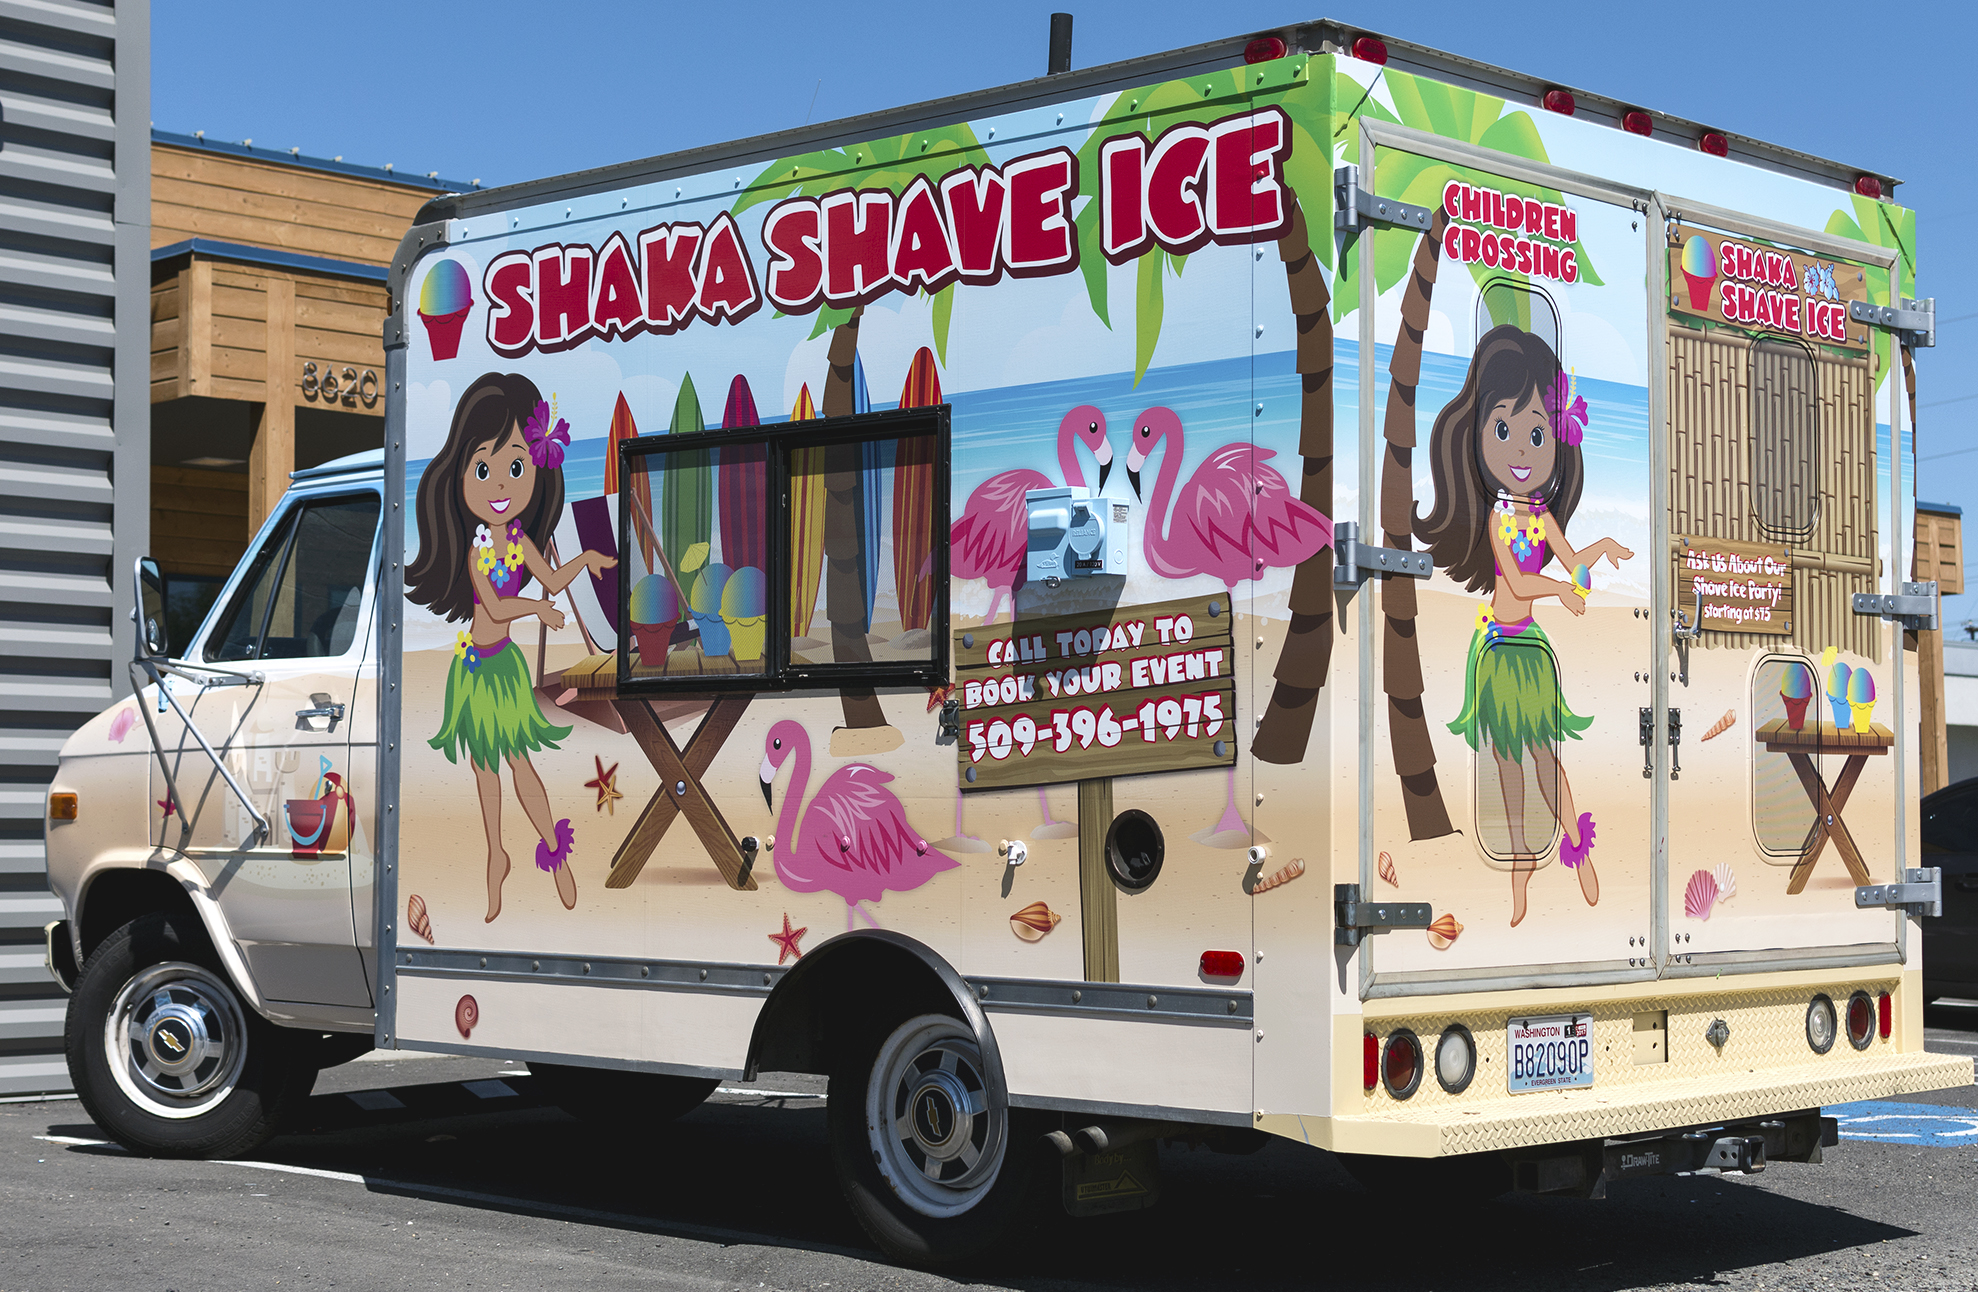 Shaka Shave Ice